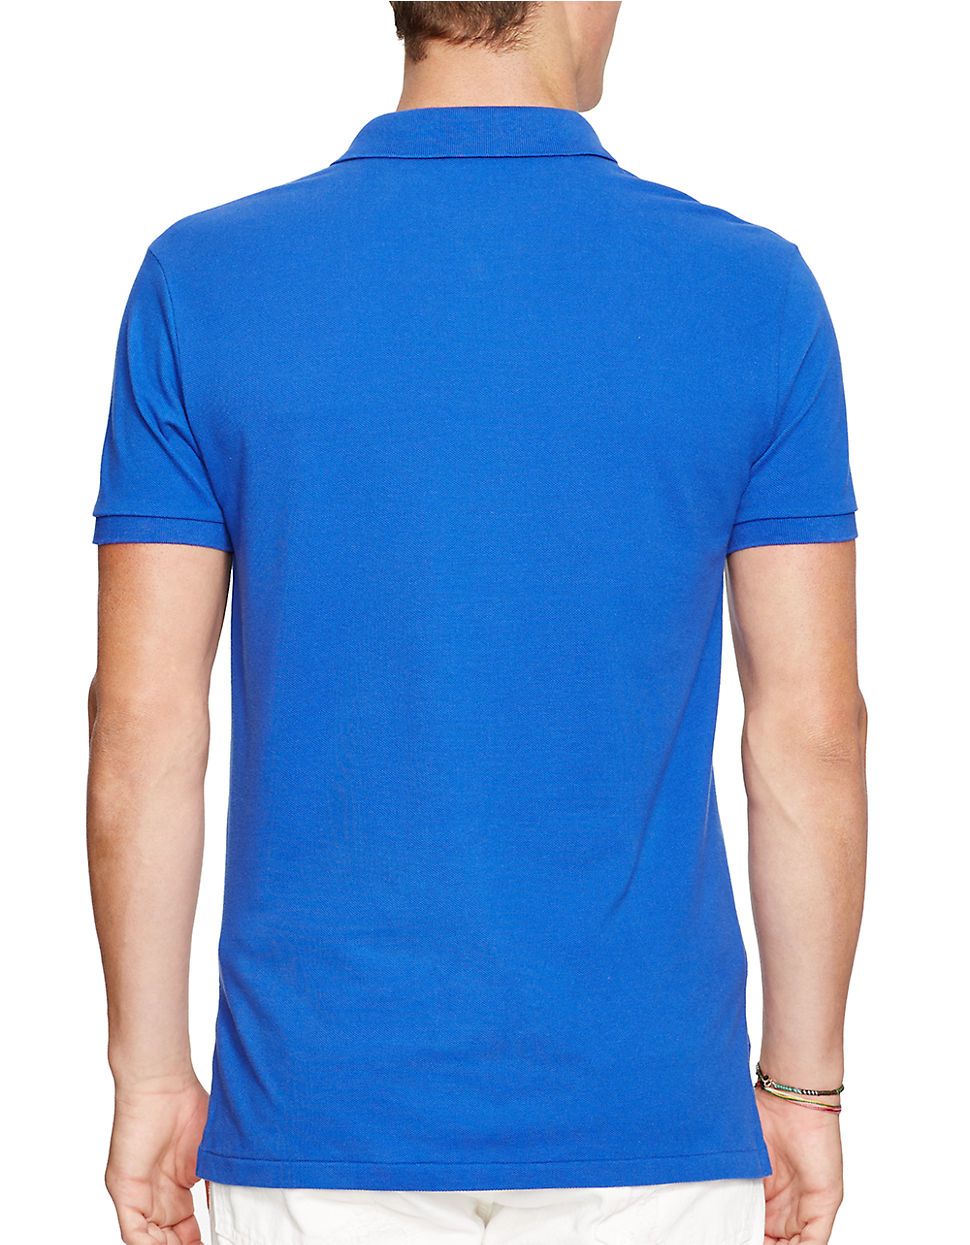 polo ralph lauren slim fit mesh polo shirt in blue for men. Black Bedroom Furniture Sets. Home Design Ideas